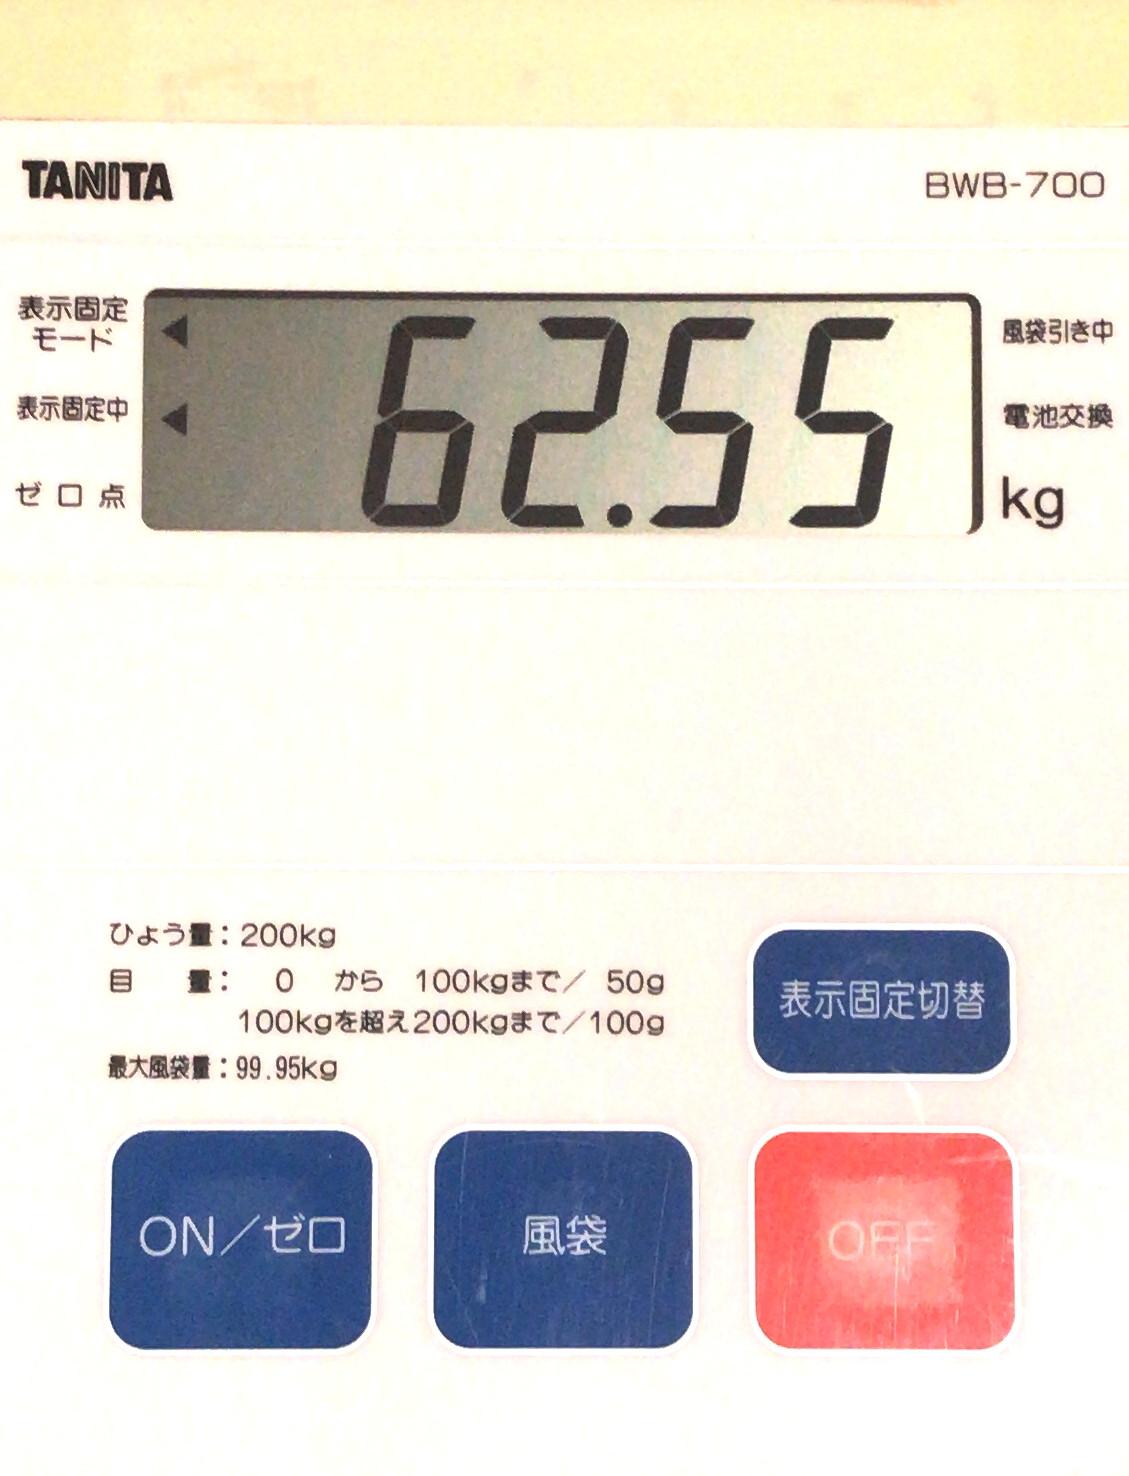 20190715-62.55kg